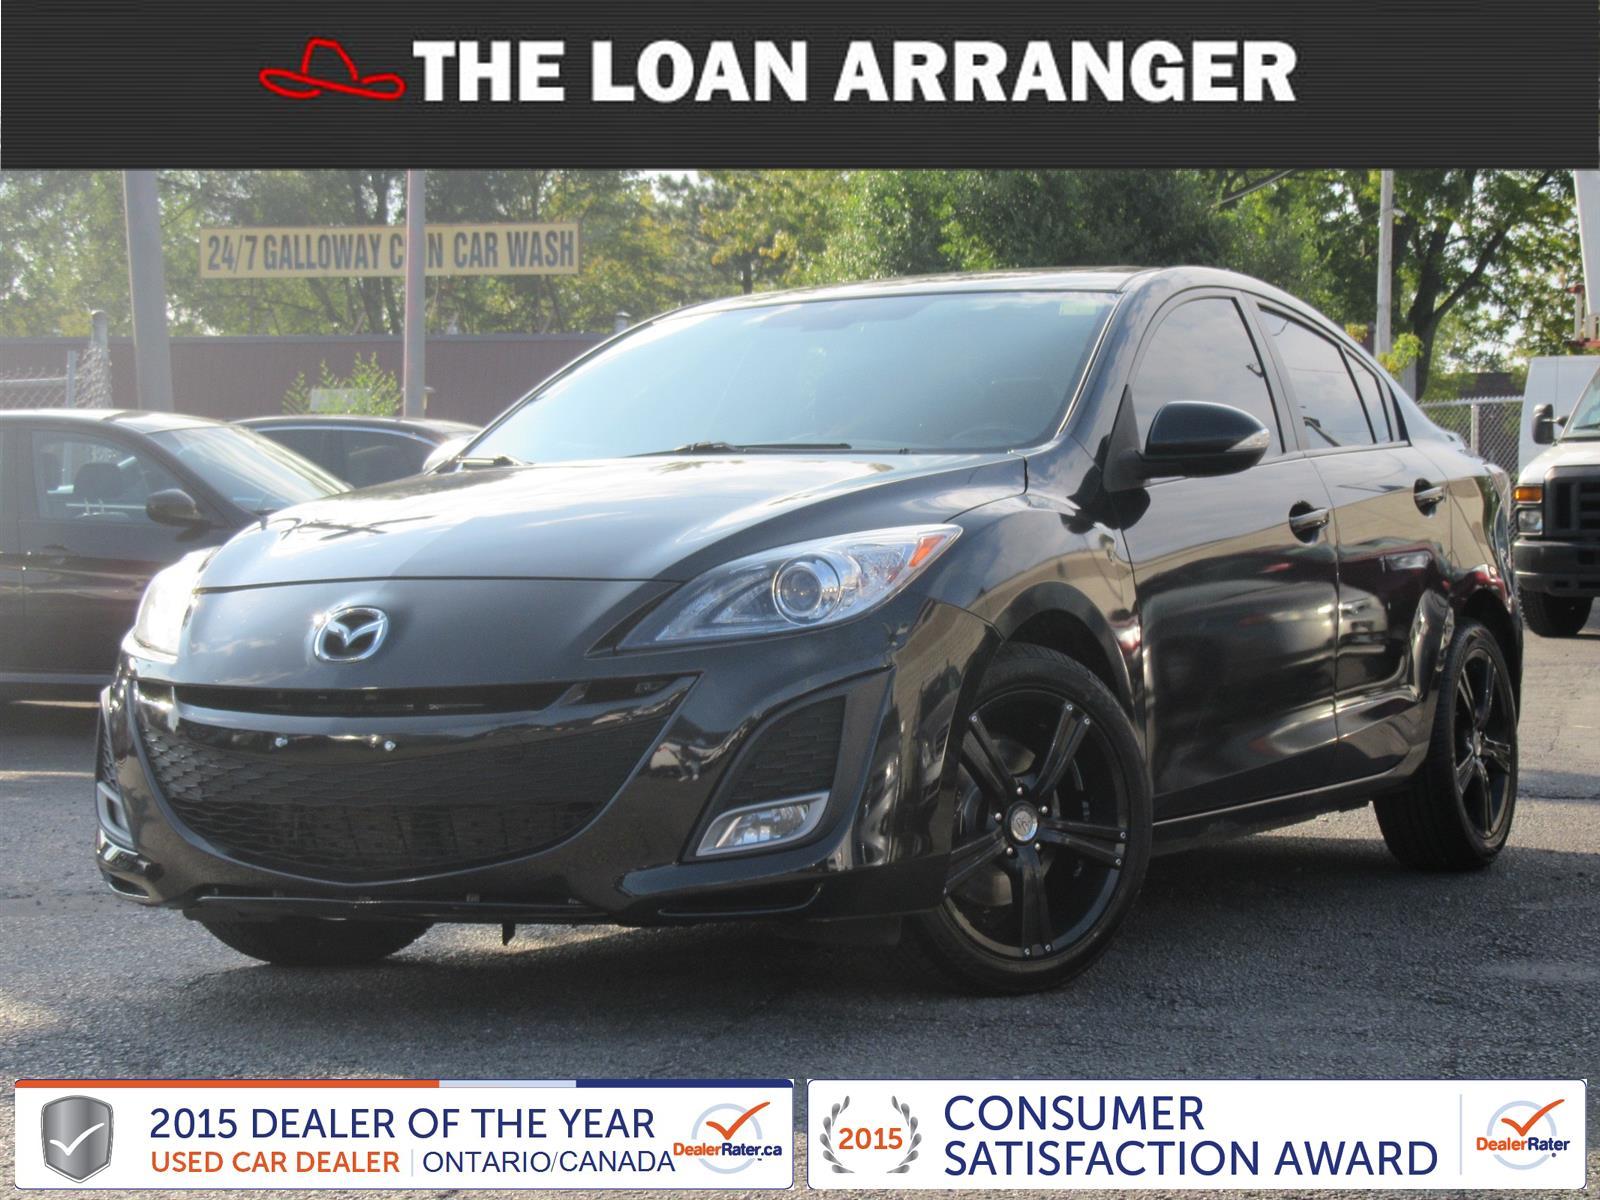 2010 Mazda Mazda3 - The Loan Arranger Cambridge